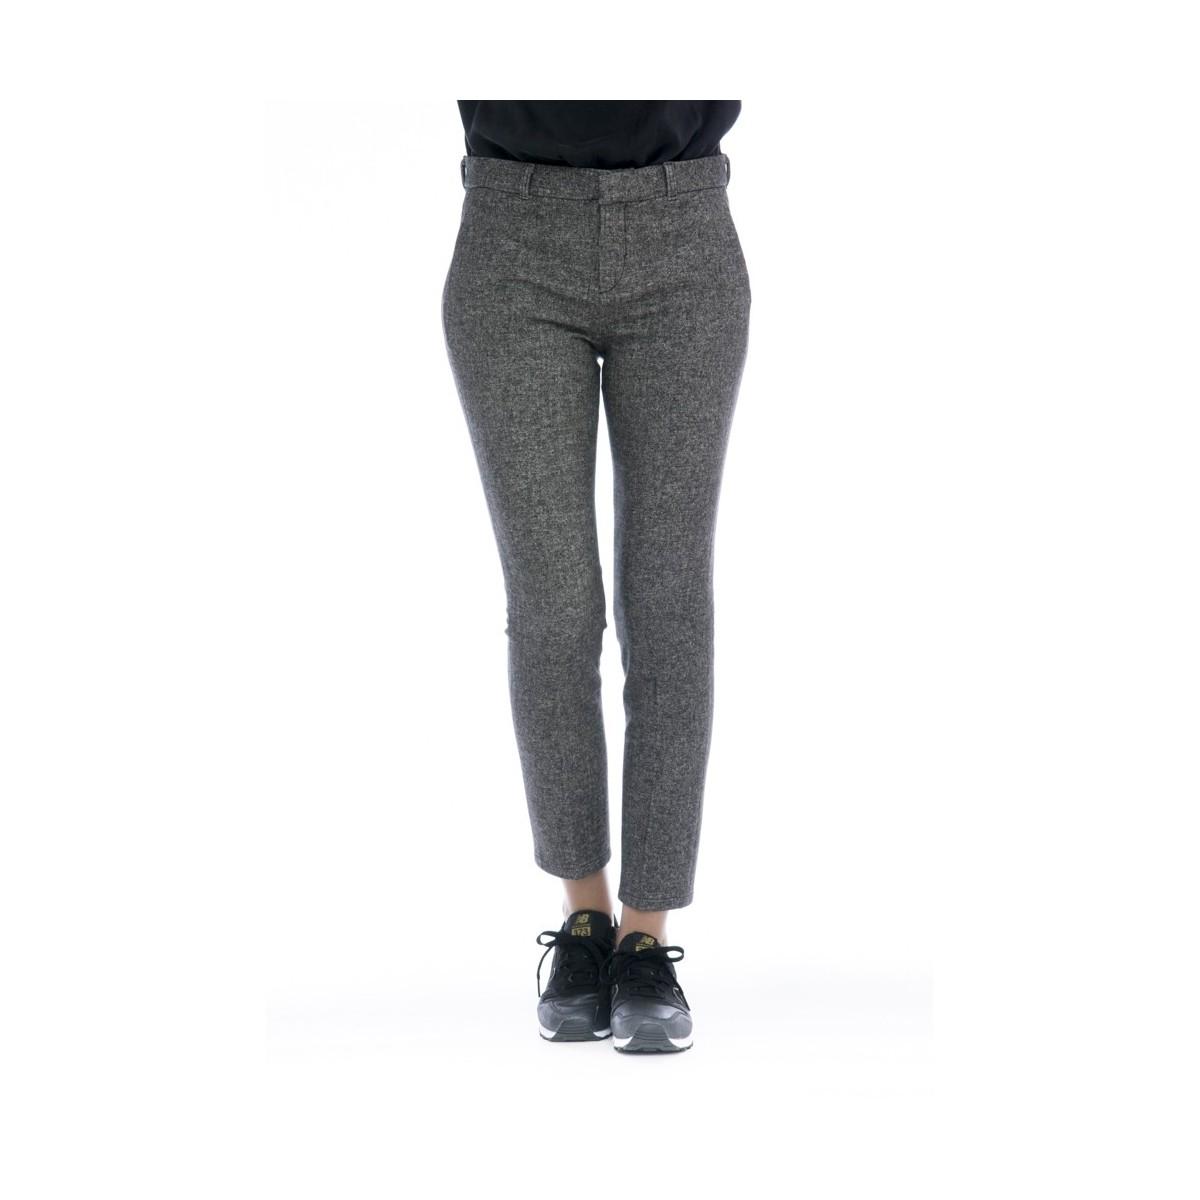 Pantalone donna Circolo 1901 - Fd706 pantalone felpa special print